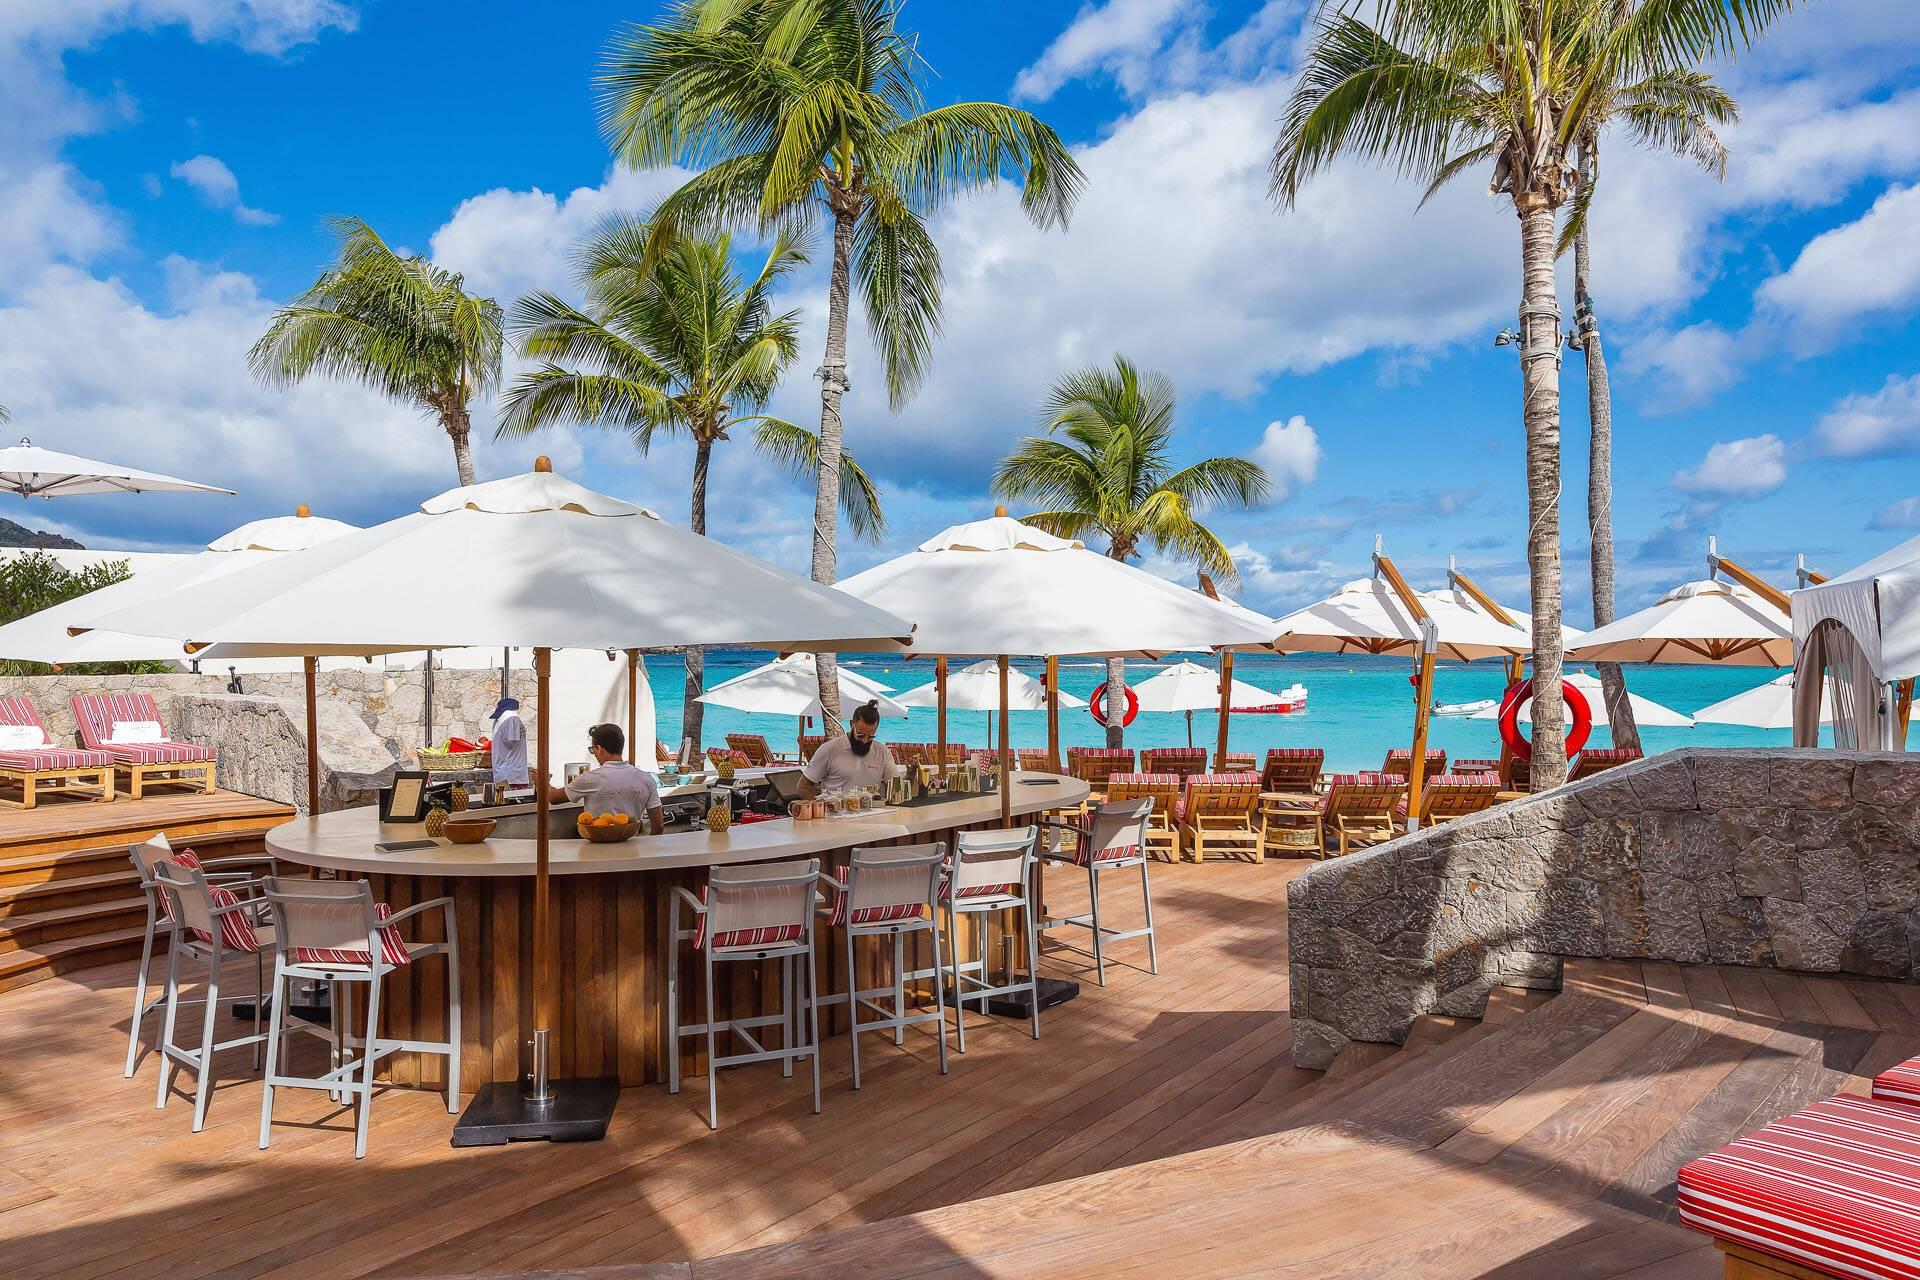 Eden Rock Saint Barth Beach Bar